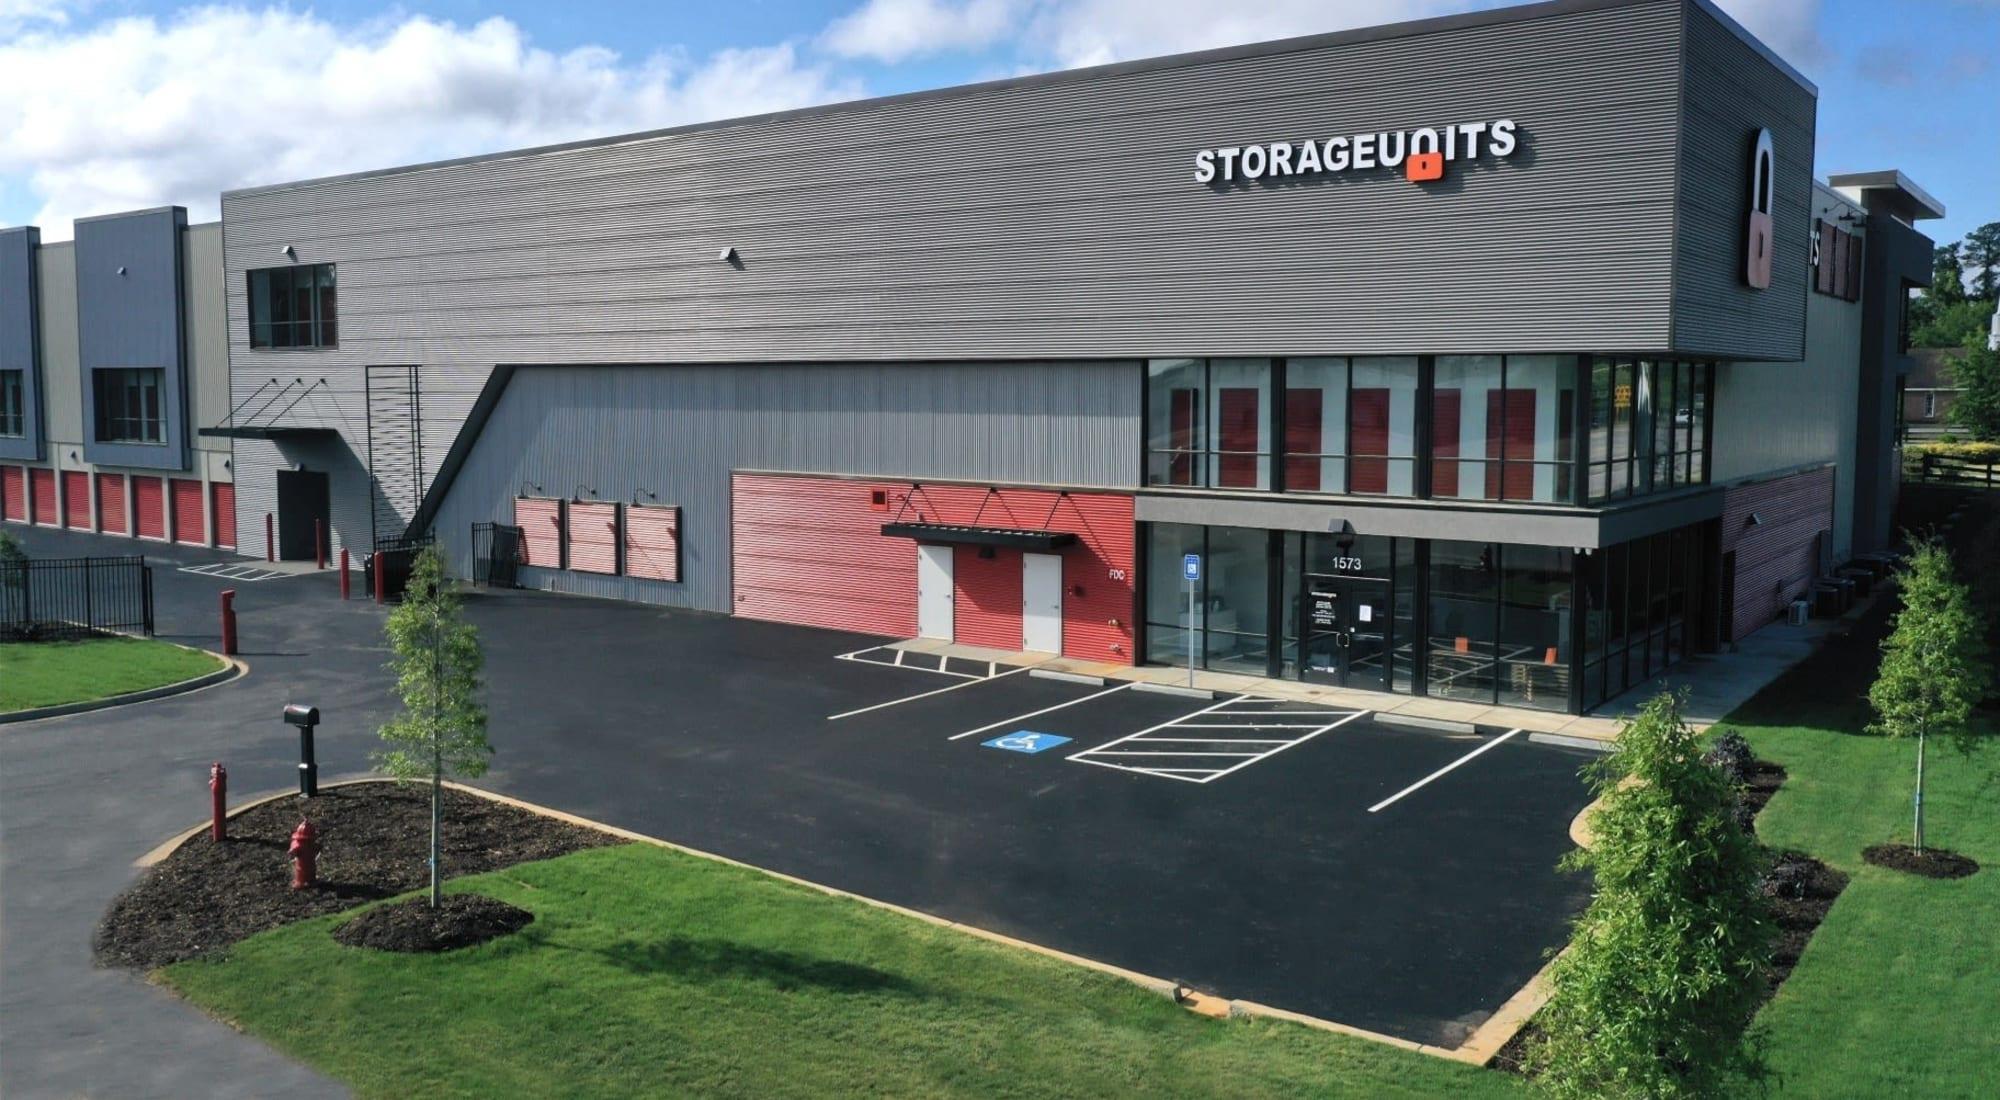 Contact us today at Storage Units in Aiken, South Carolina